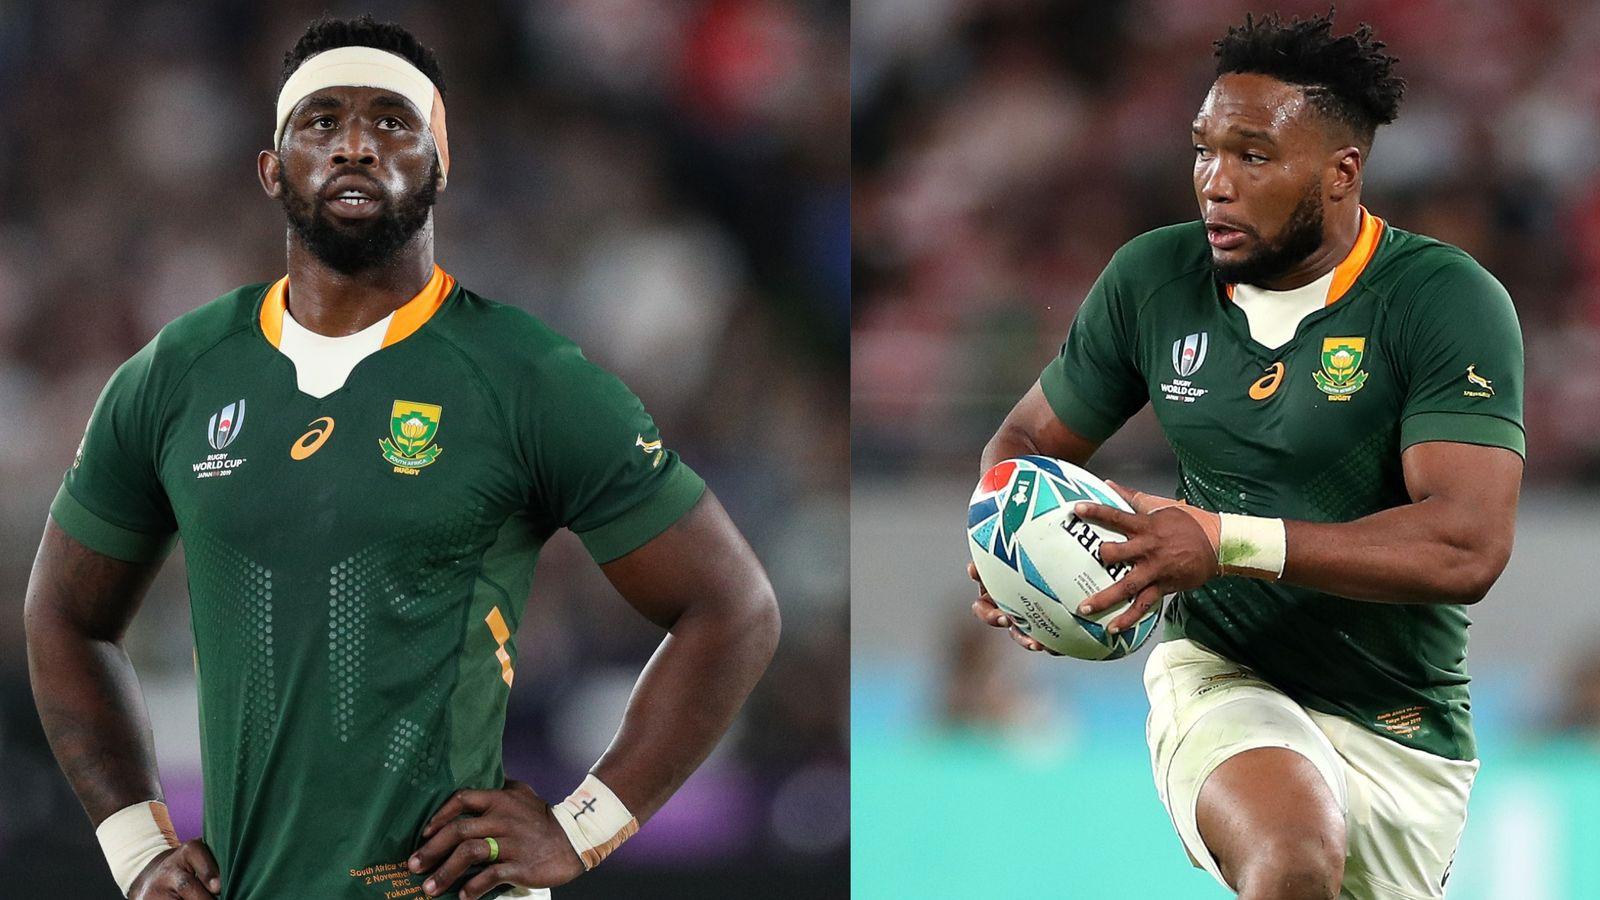 Springbok Showdown: A high-scoring rugby celebration